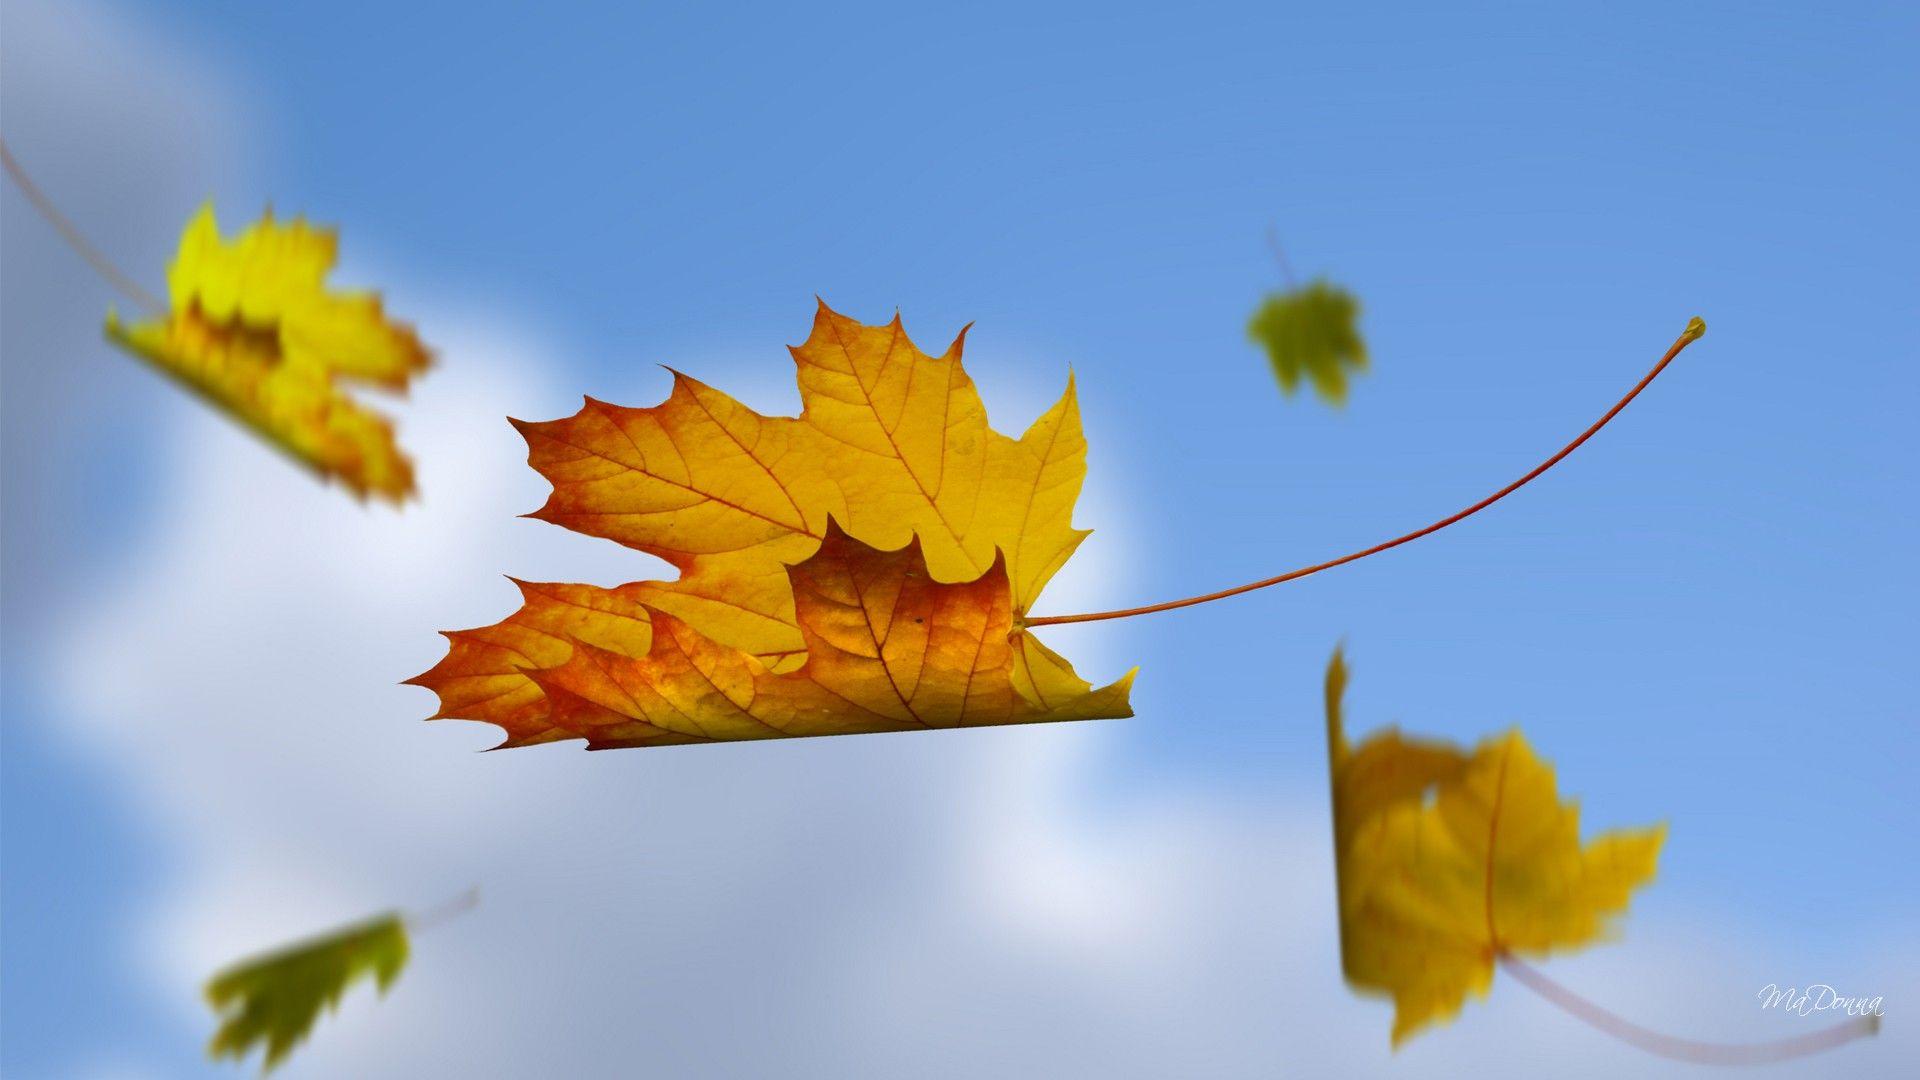 Falling Leaves 3d Falling Leaves Hd Wallpapers 3d Falling Leaves Hd Wallpapers Autumn Leaves Art Autumn Leaves Leaf Art Falling leaves moving wallpaper